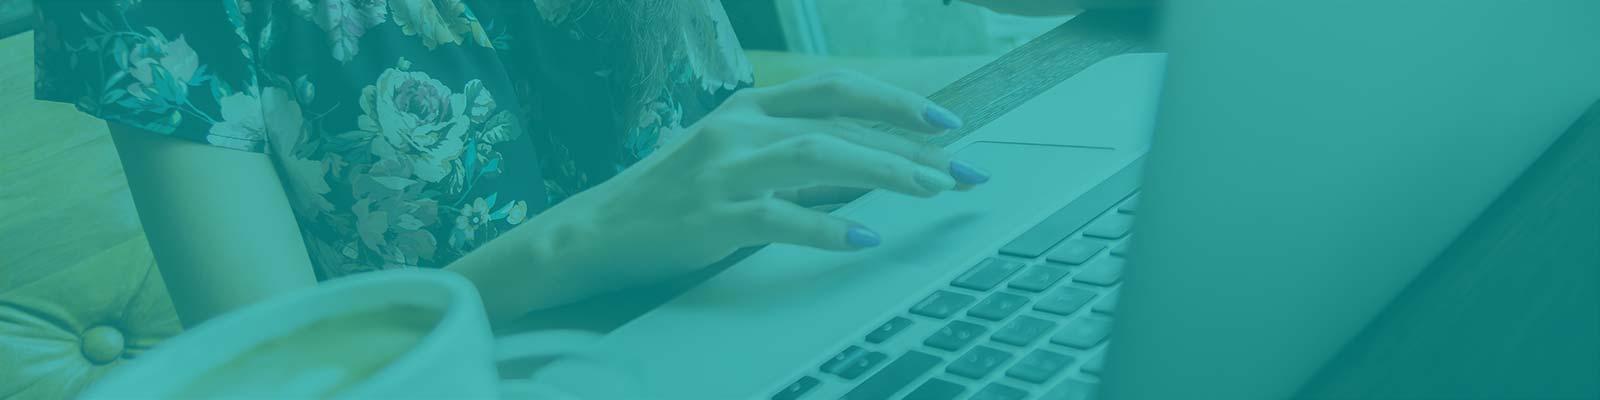 How to Vet Plugins for Your WordPress Website